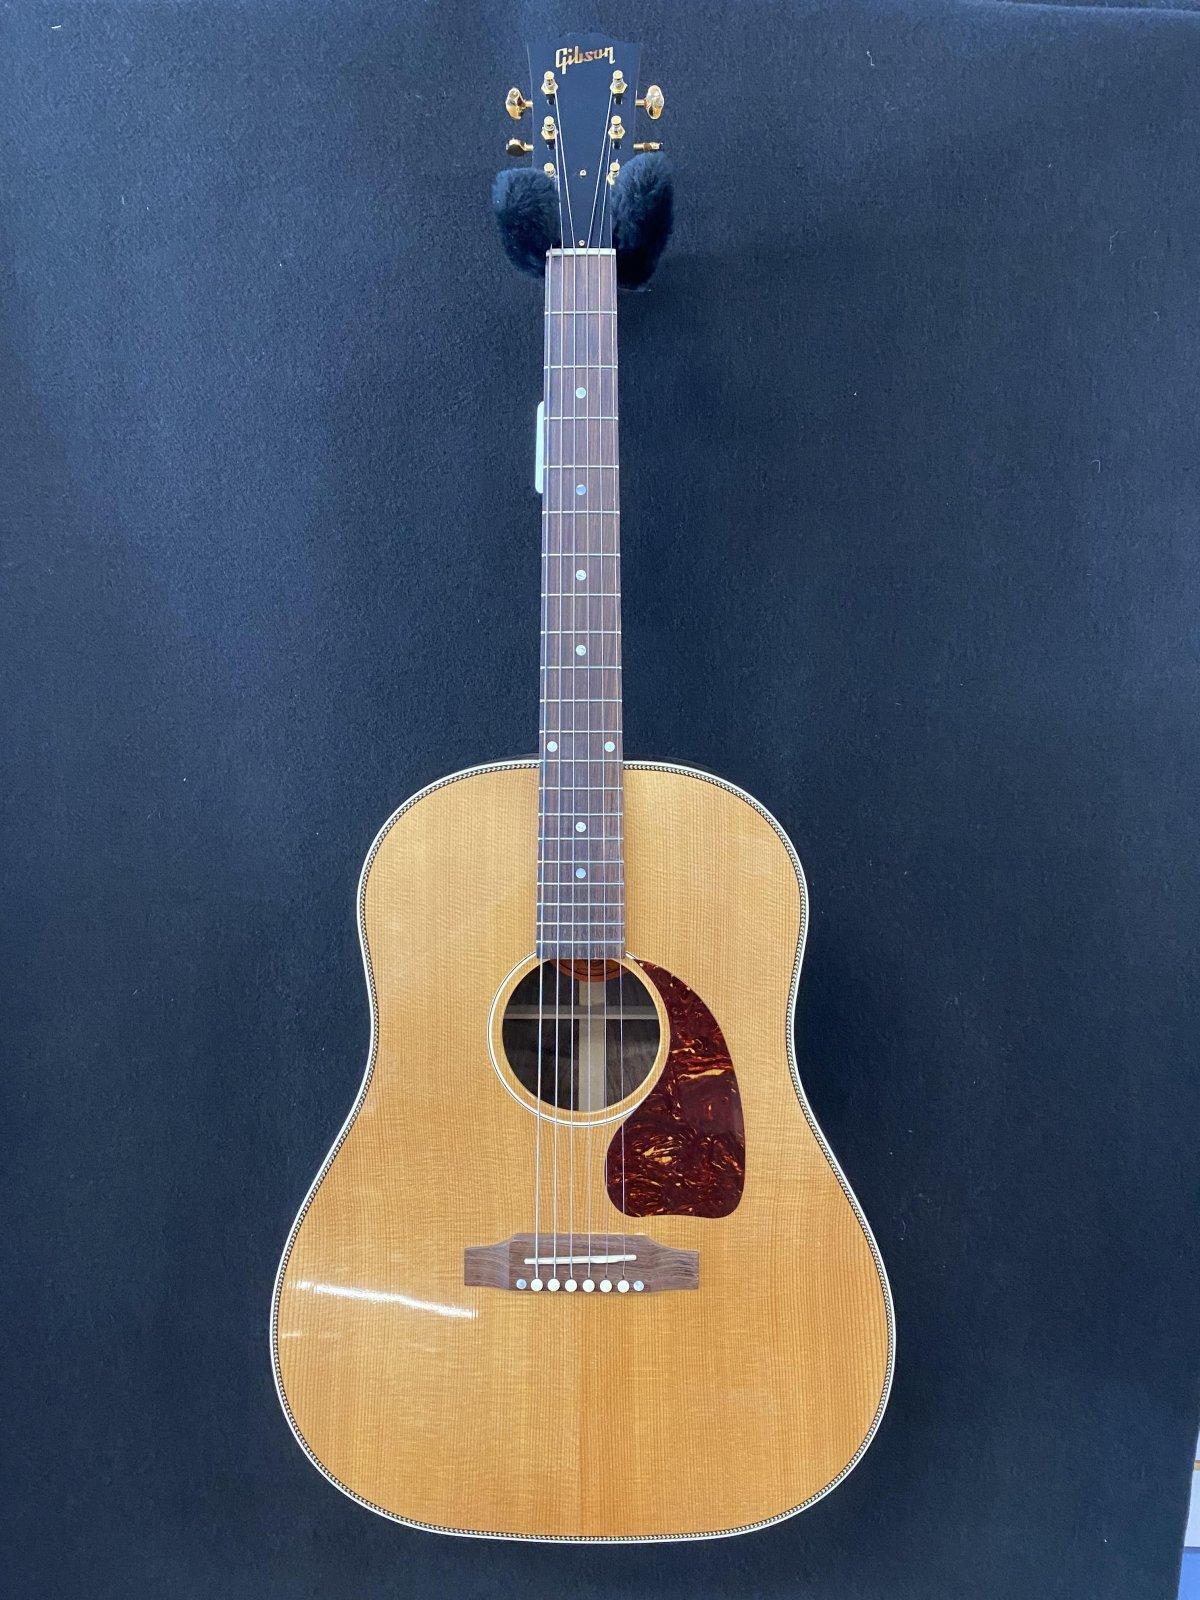 2003 Gibson J45 12th Fret